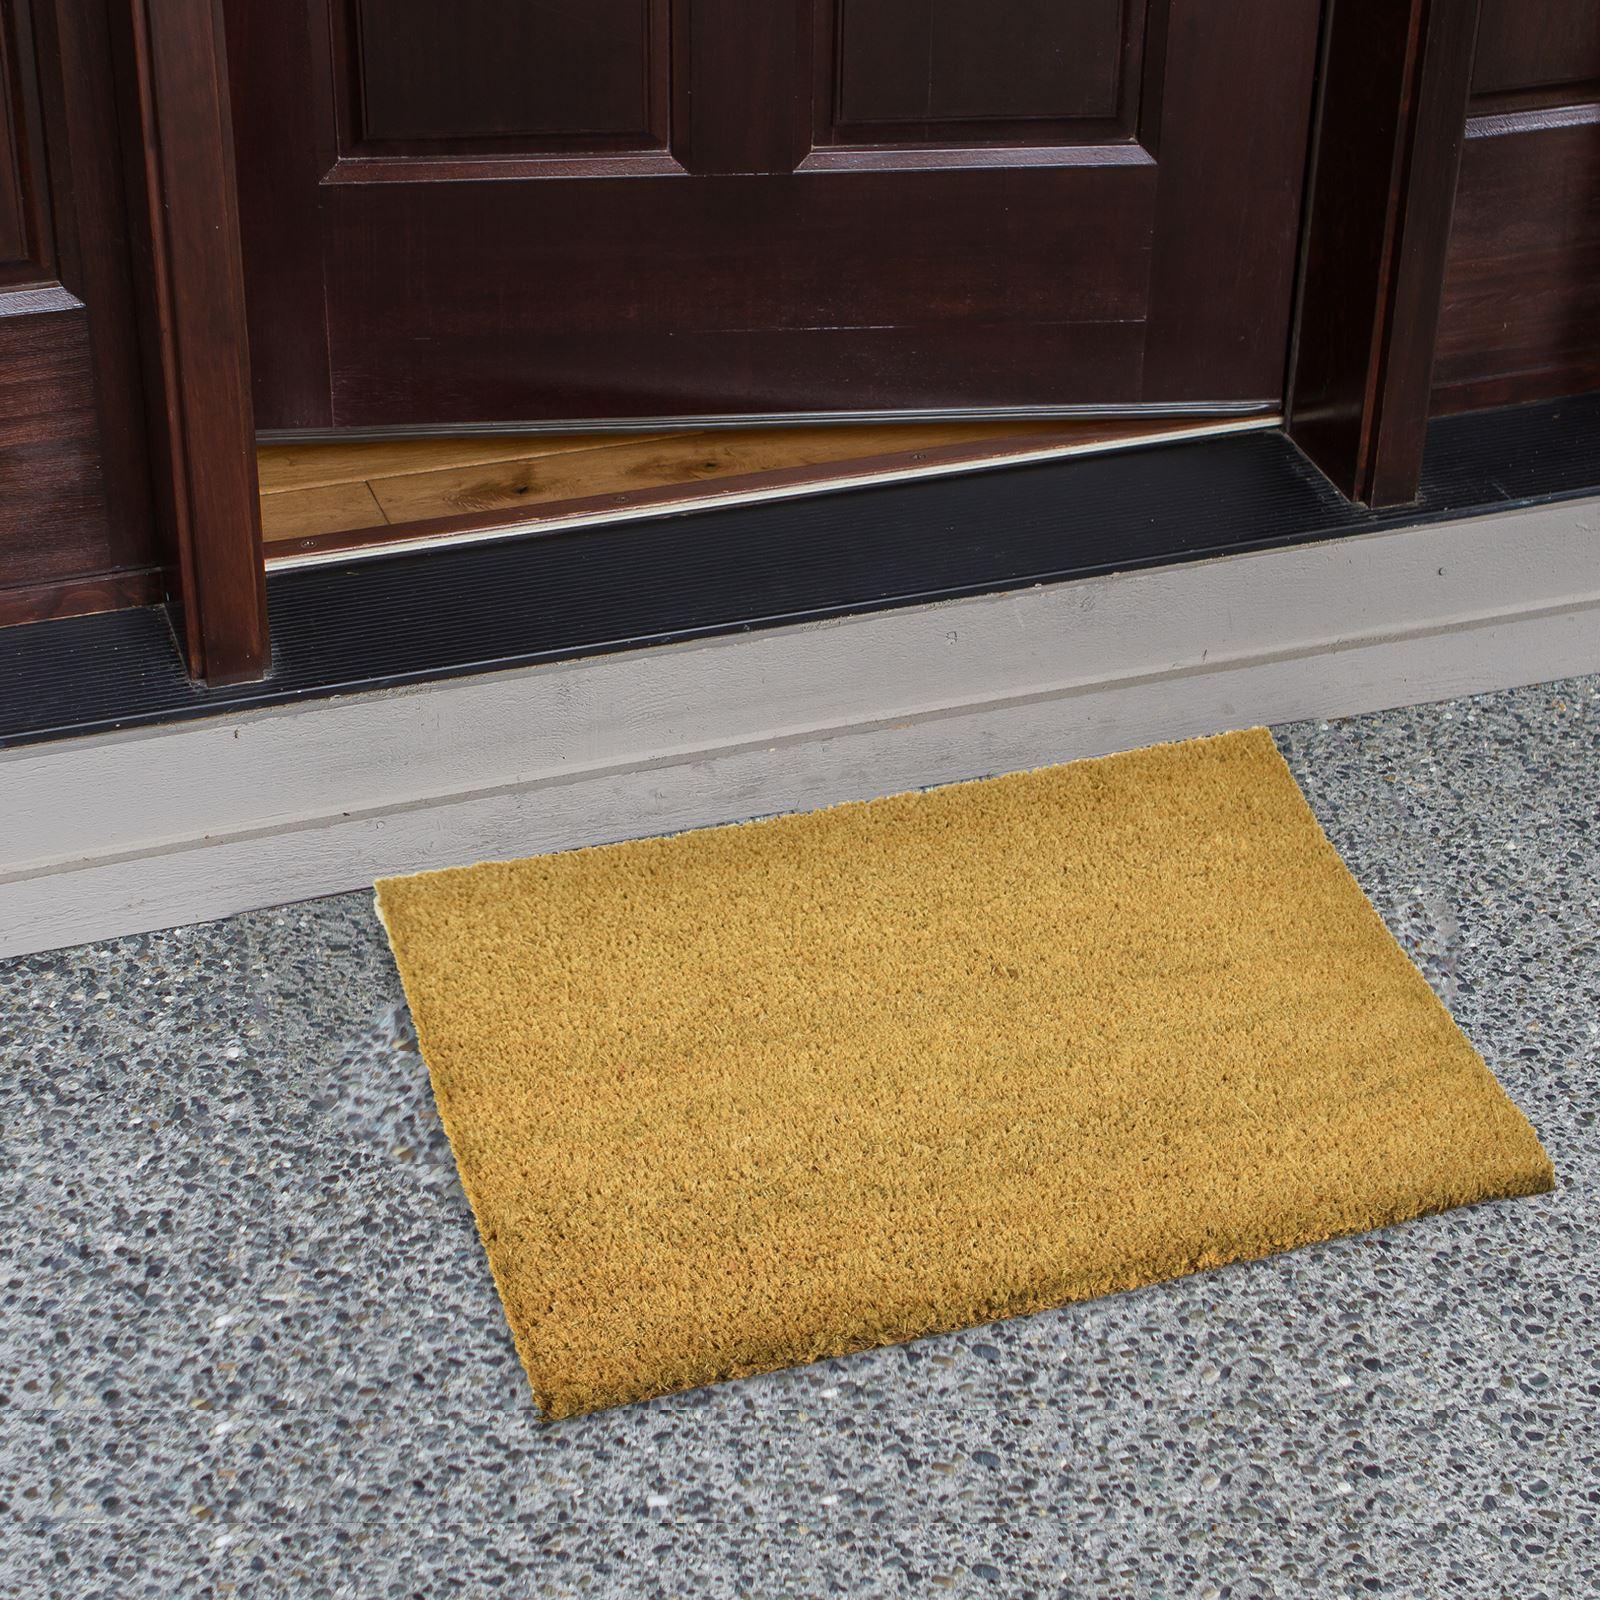 Plain-Non-Slip-Door-Mat-Tough-Natural-Coir-PVC-Back-Welcome-Doormat-40-x-60cm miniatura 95